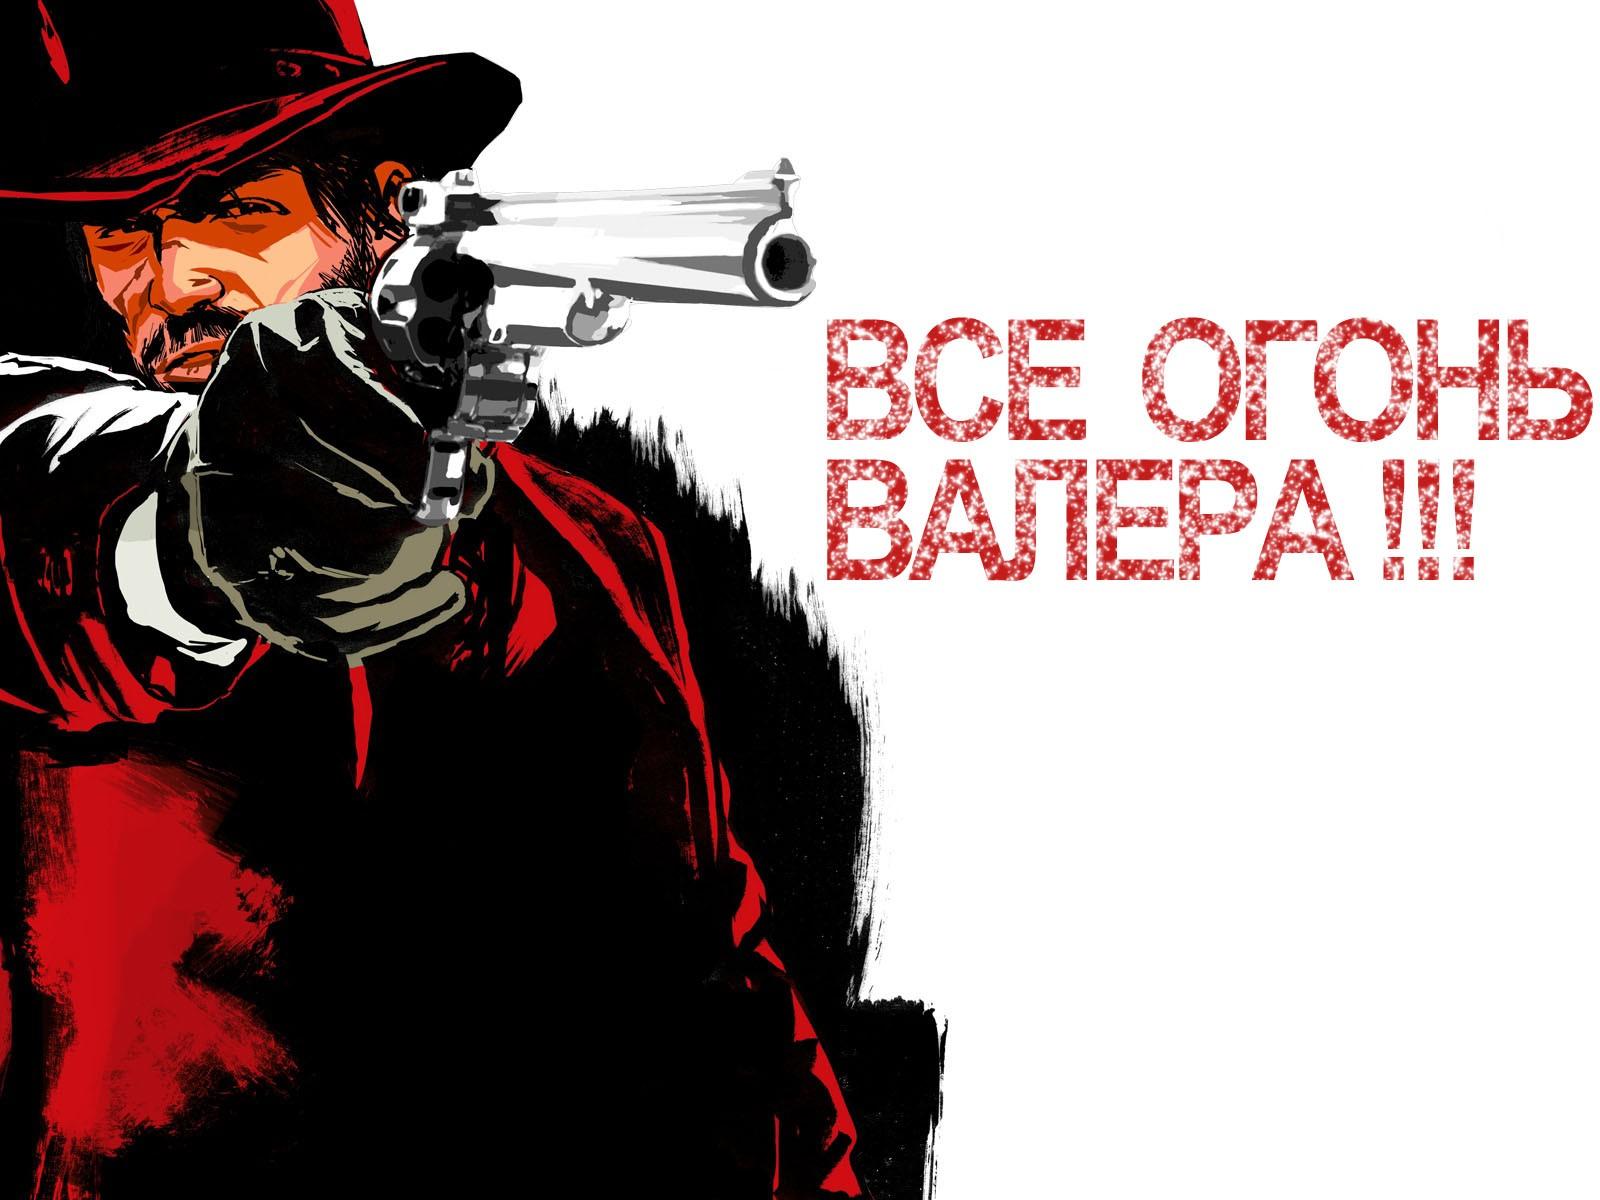 НАРКОМАН ПАВЛИК Фото, Все Агонь ...: wallspaper.ru/oboi/other/3566-narkoman-pavlik-foto.html